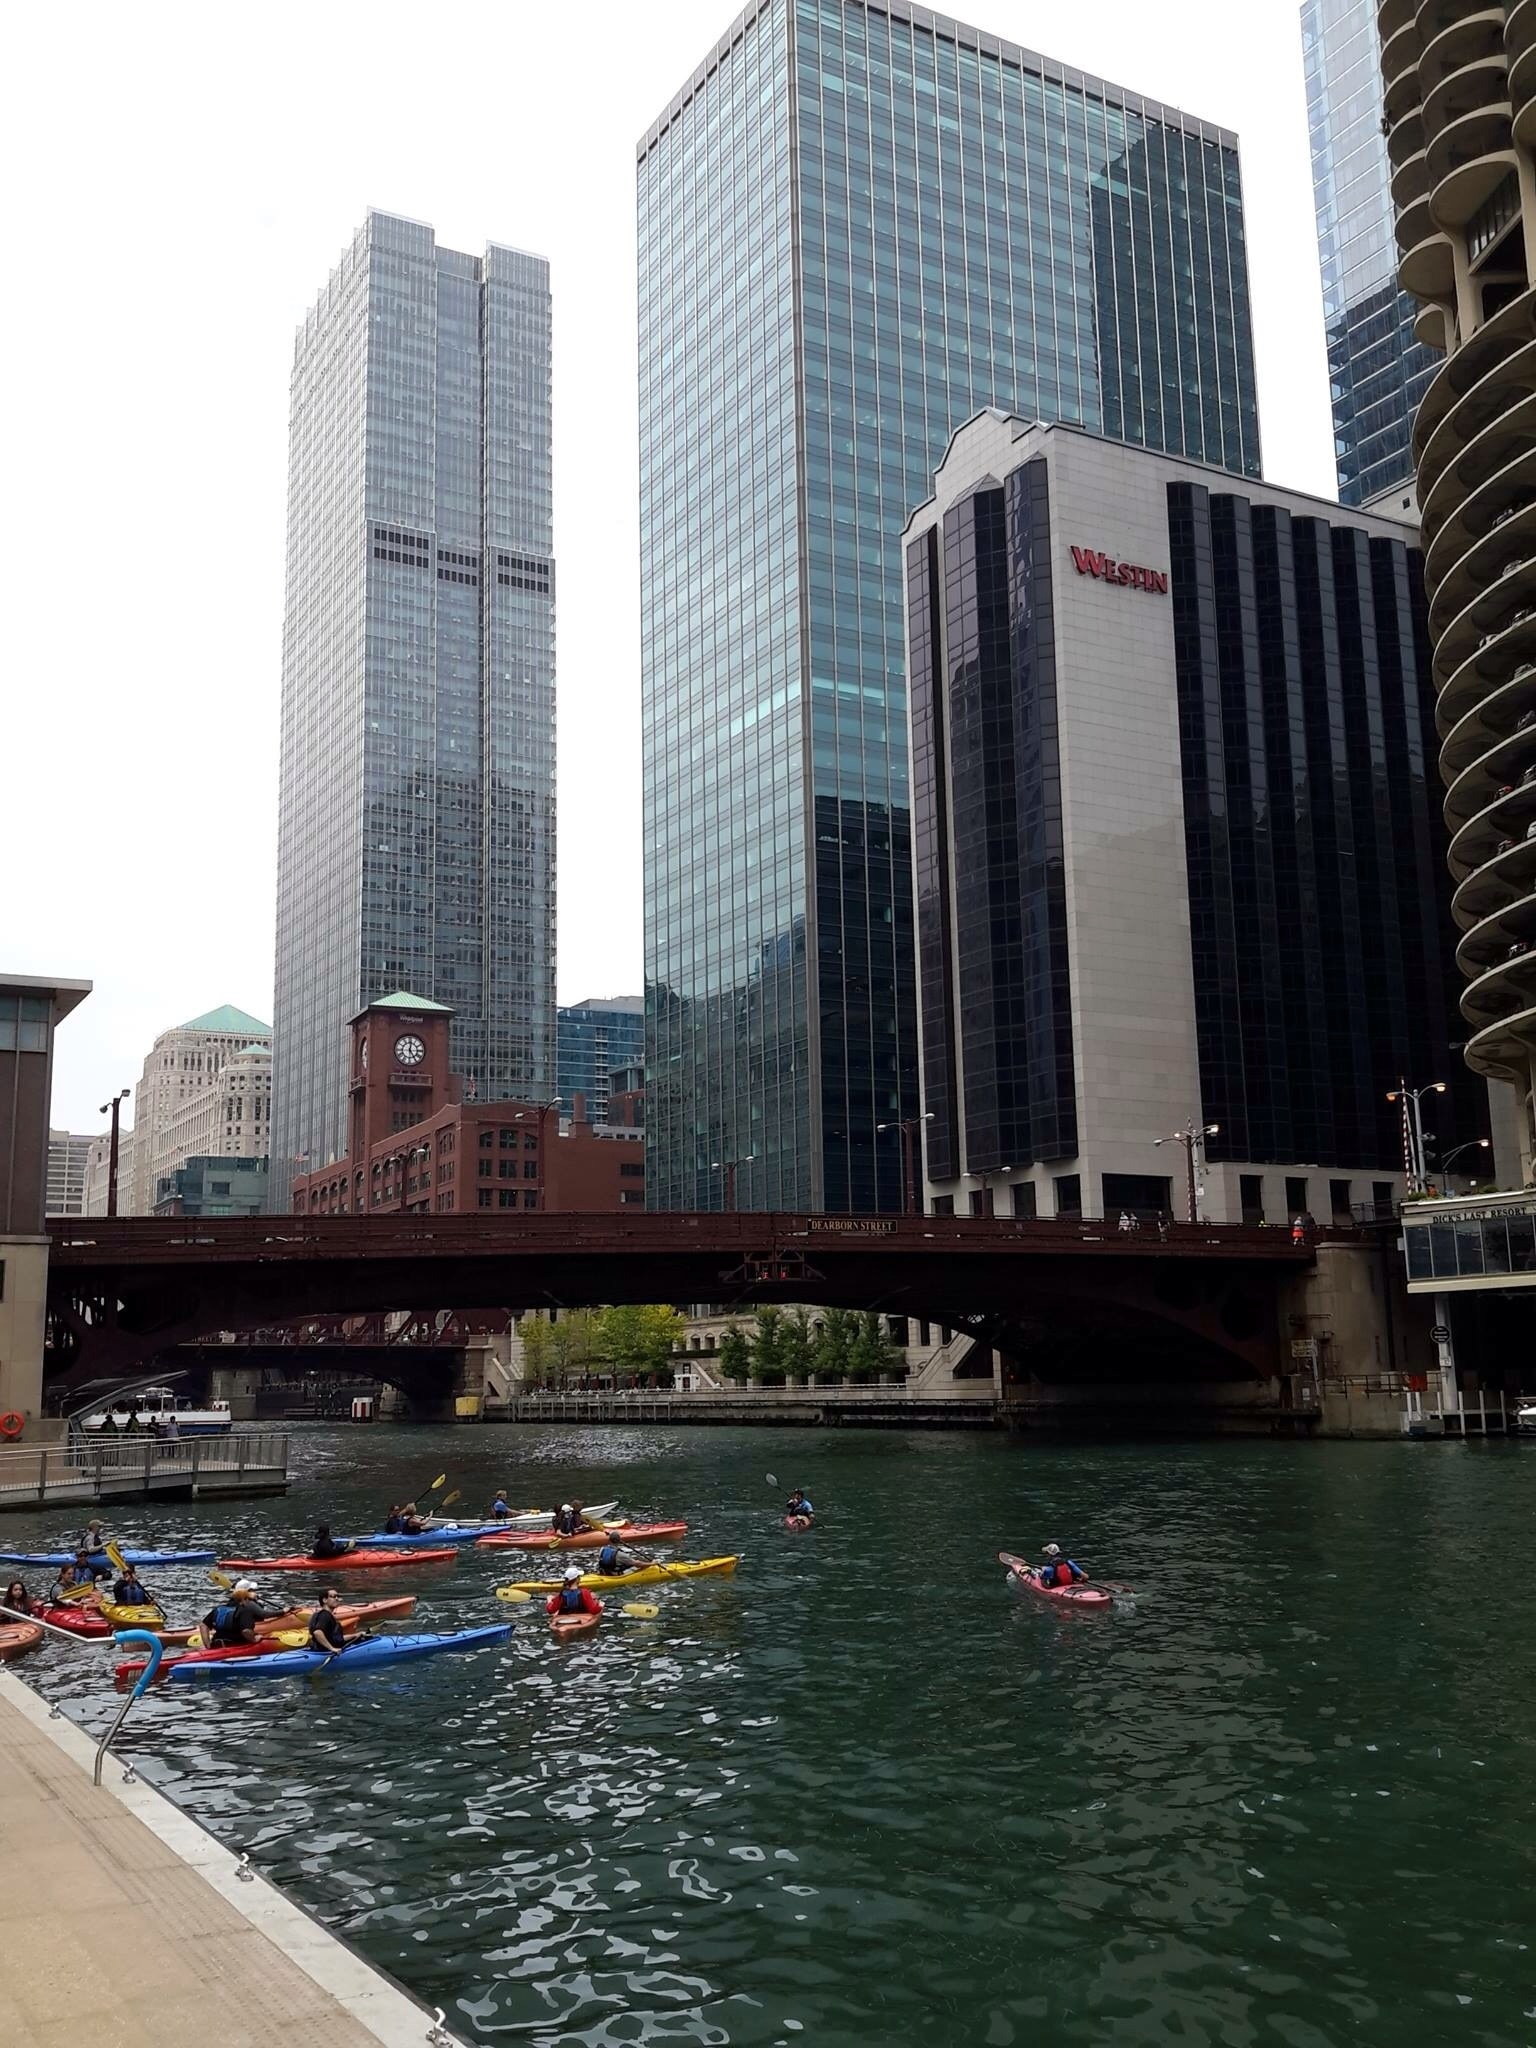 North Center, Chicago, Illinois, United States of America